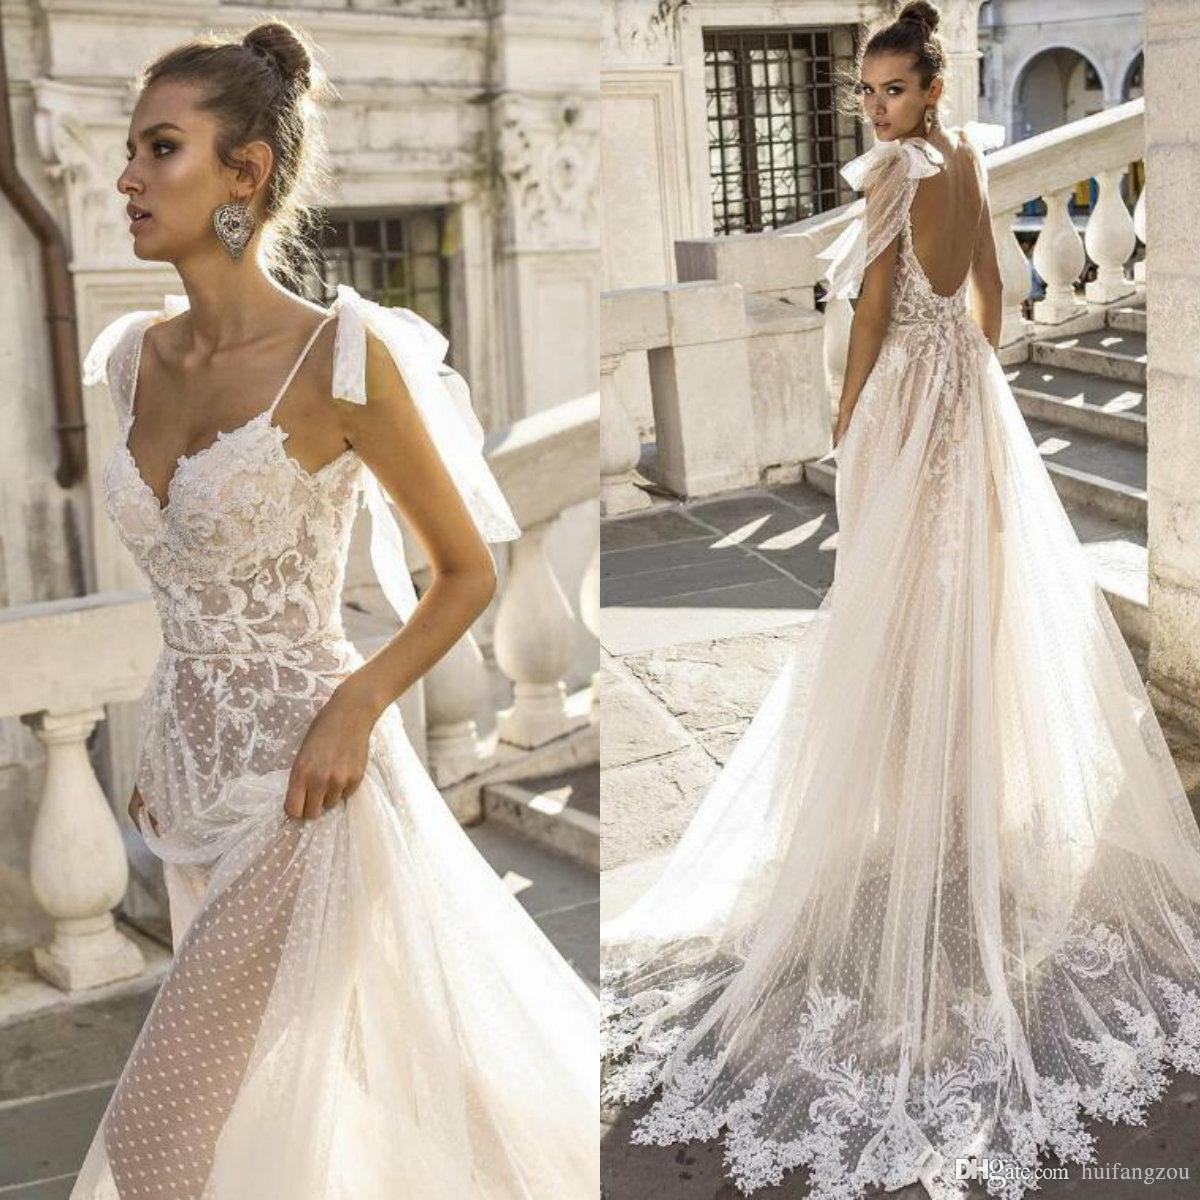 ab456e171d Discount 2019 Sexy Boho Wedding Dresses Spaghetti Straps Illusion Lace  Backless Bridal Gowns Vestido De Novia Beach Wedding Dress Cheap Wedding  Dresses ...